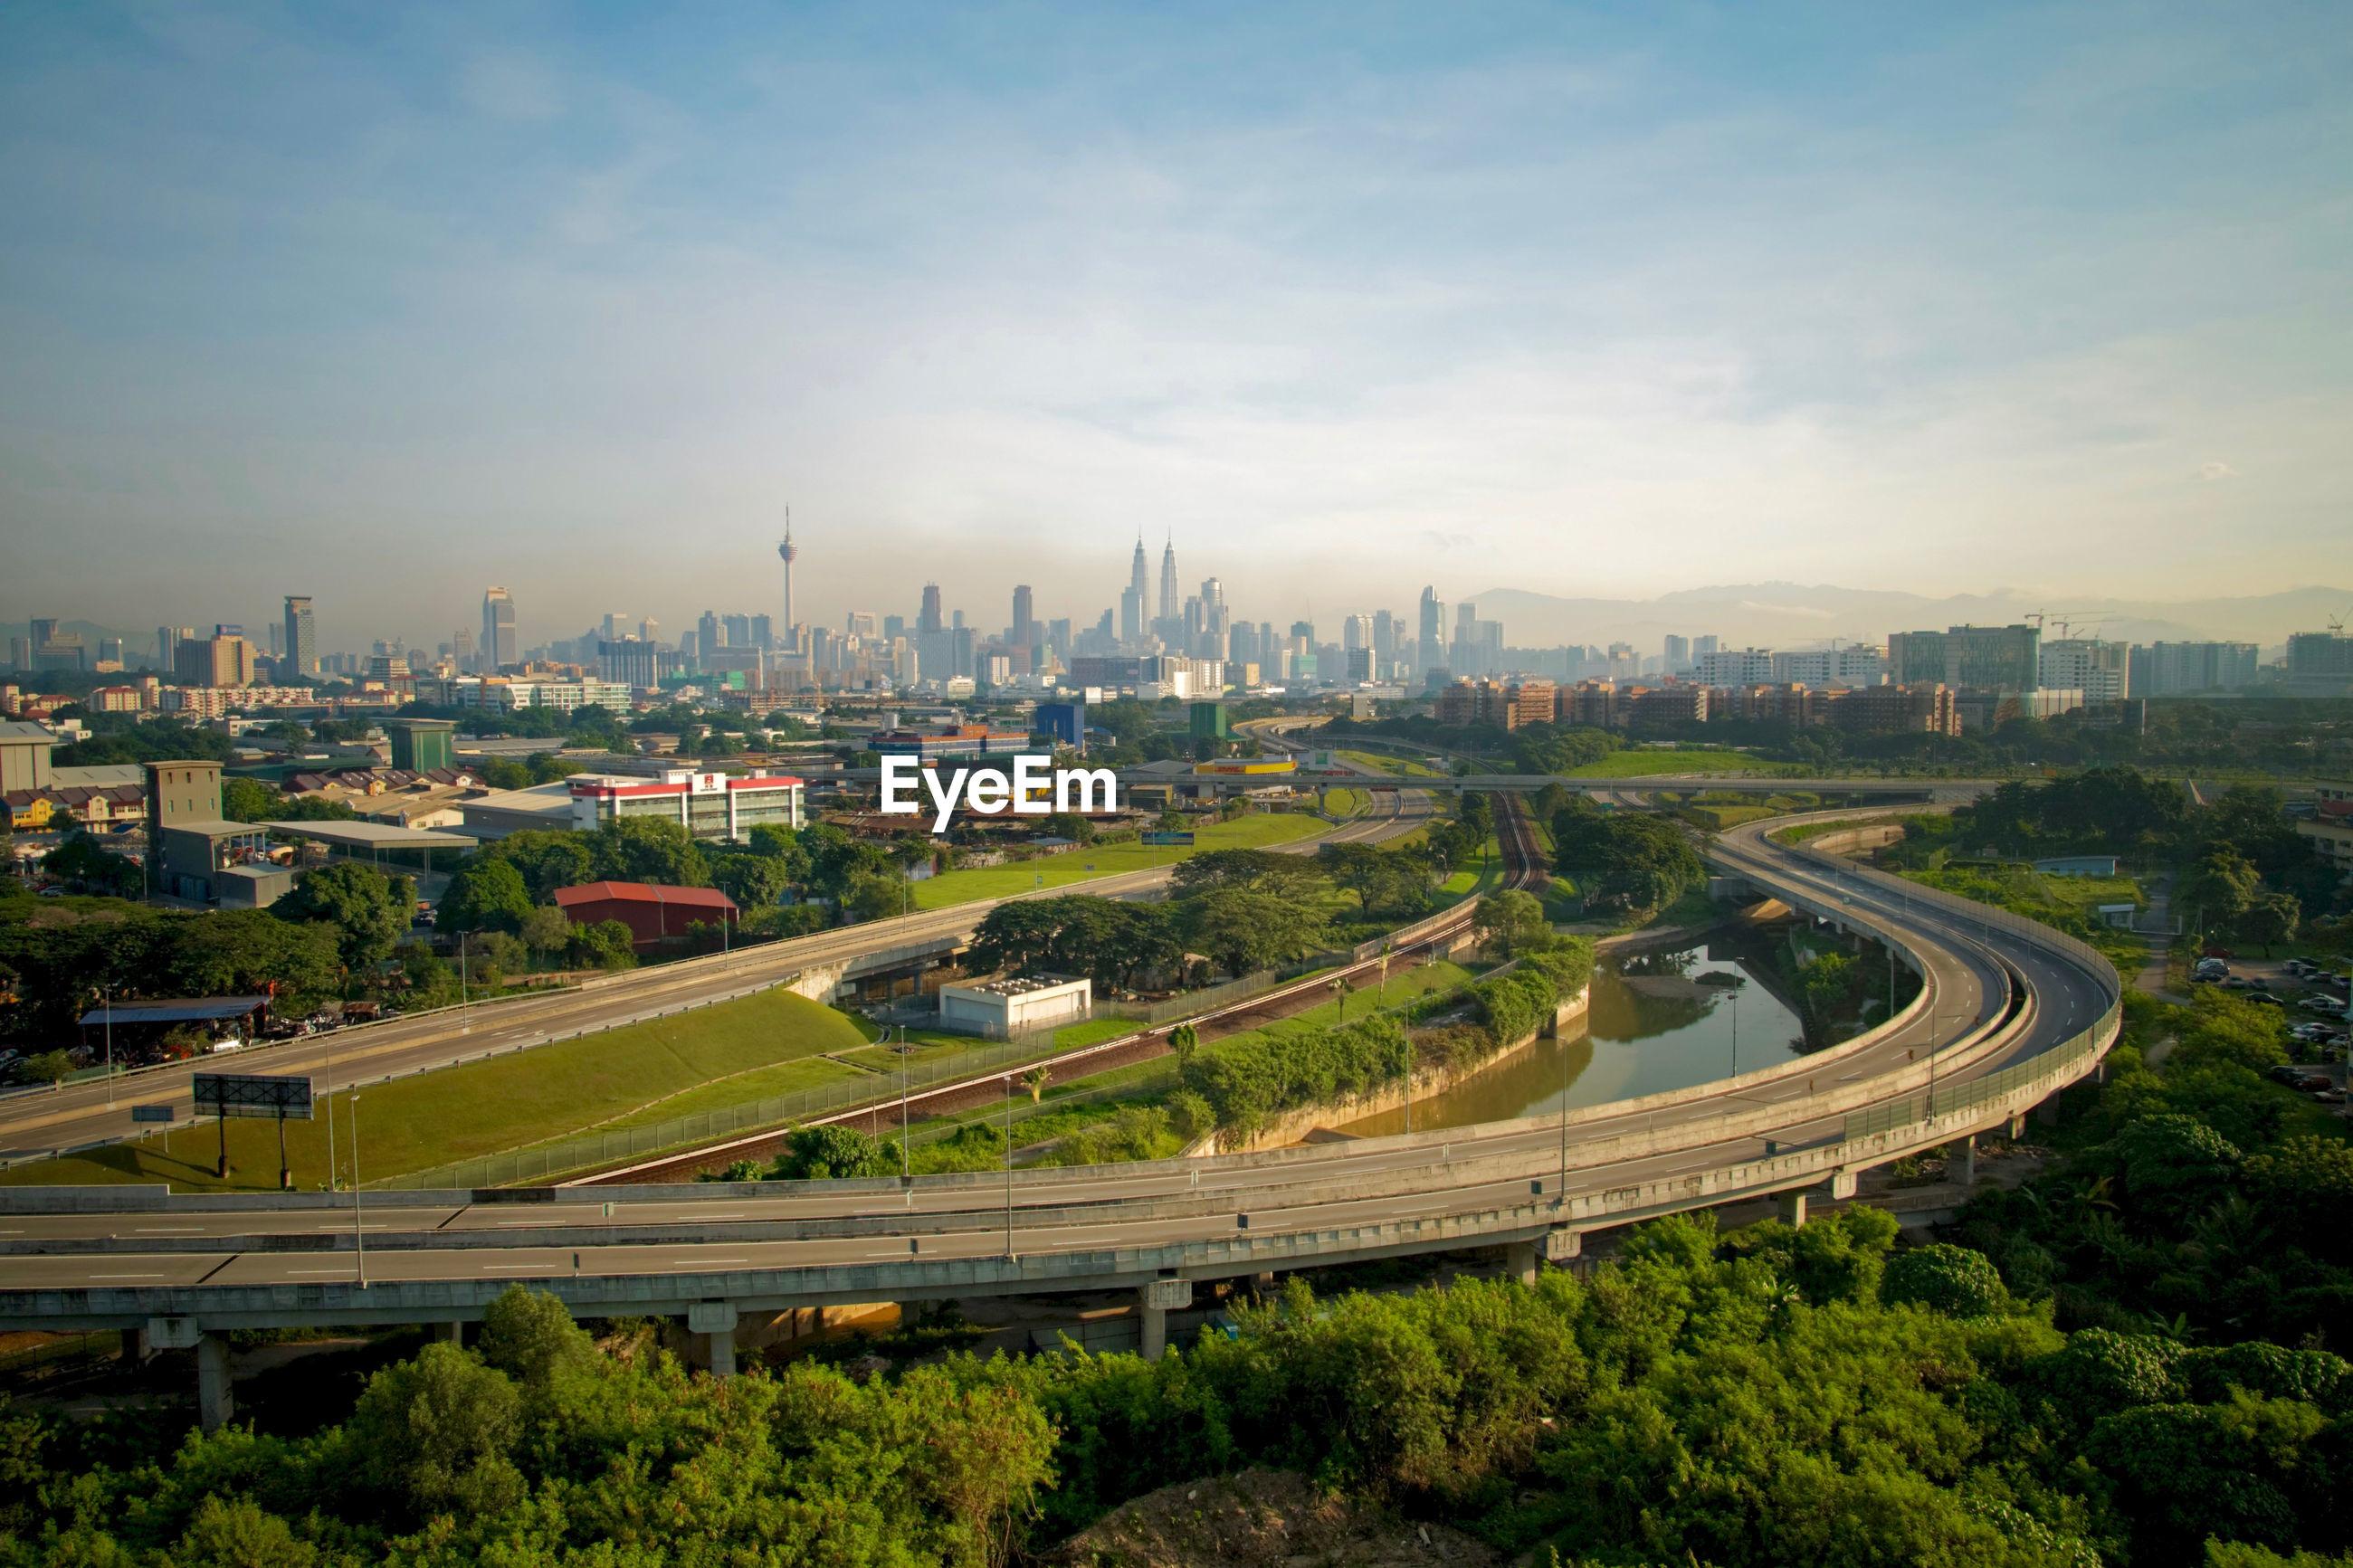 Bridge over river against cityscape